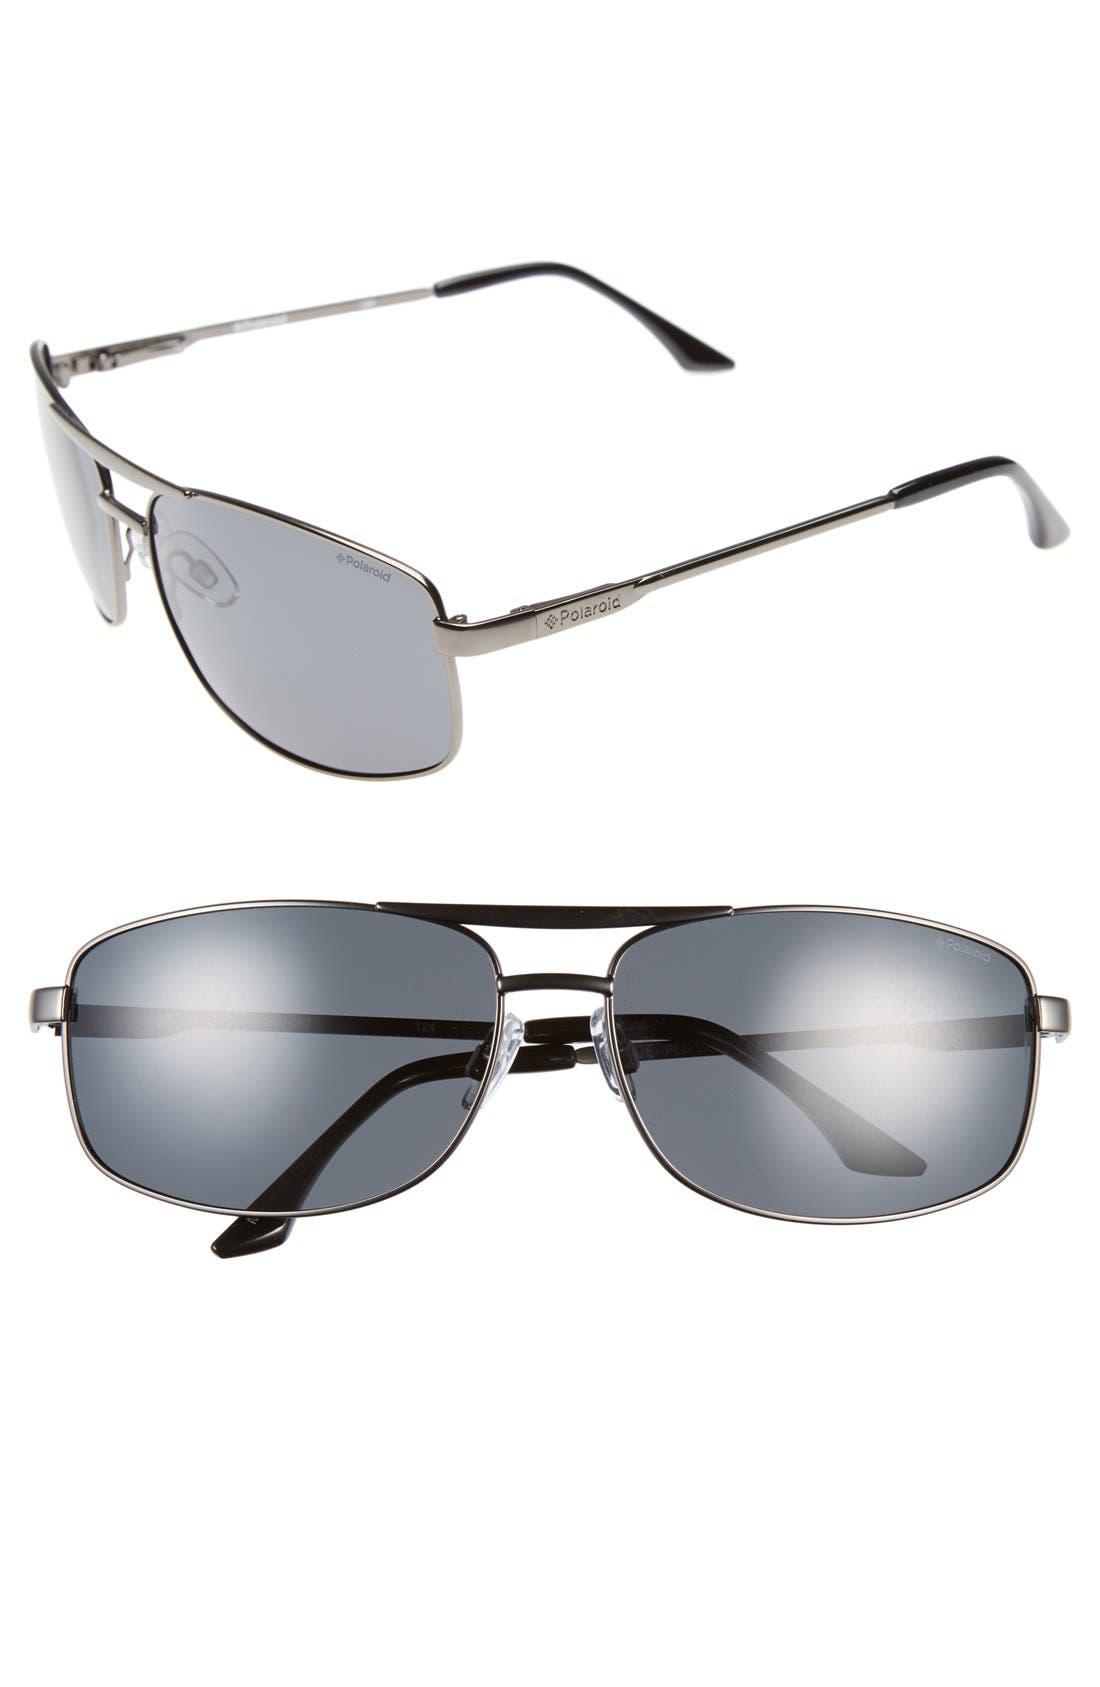 Alternate Image 1 Selected - Polaroid '2017S' 65mm Polarized Navigator Sunglasses